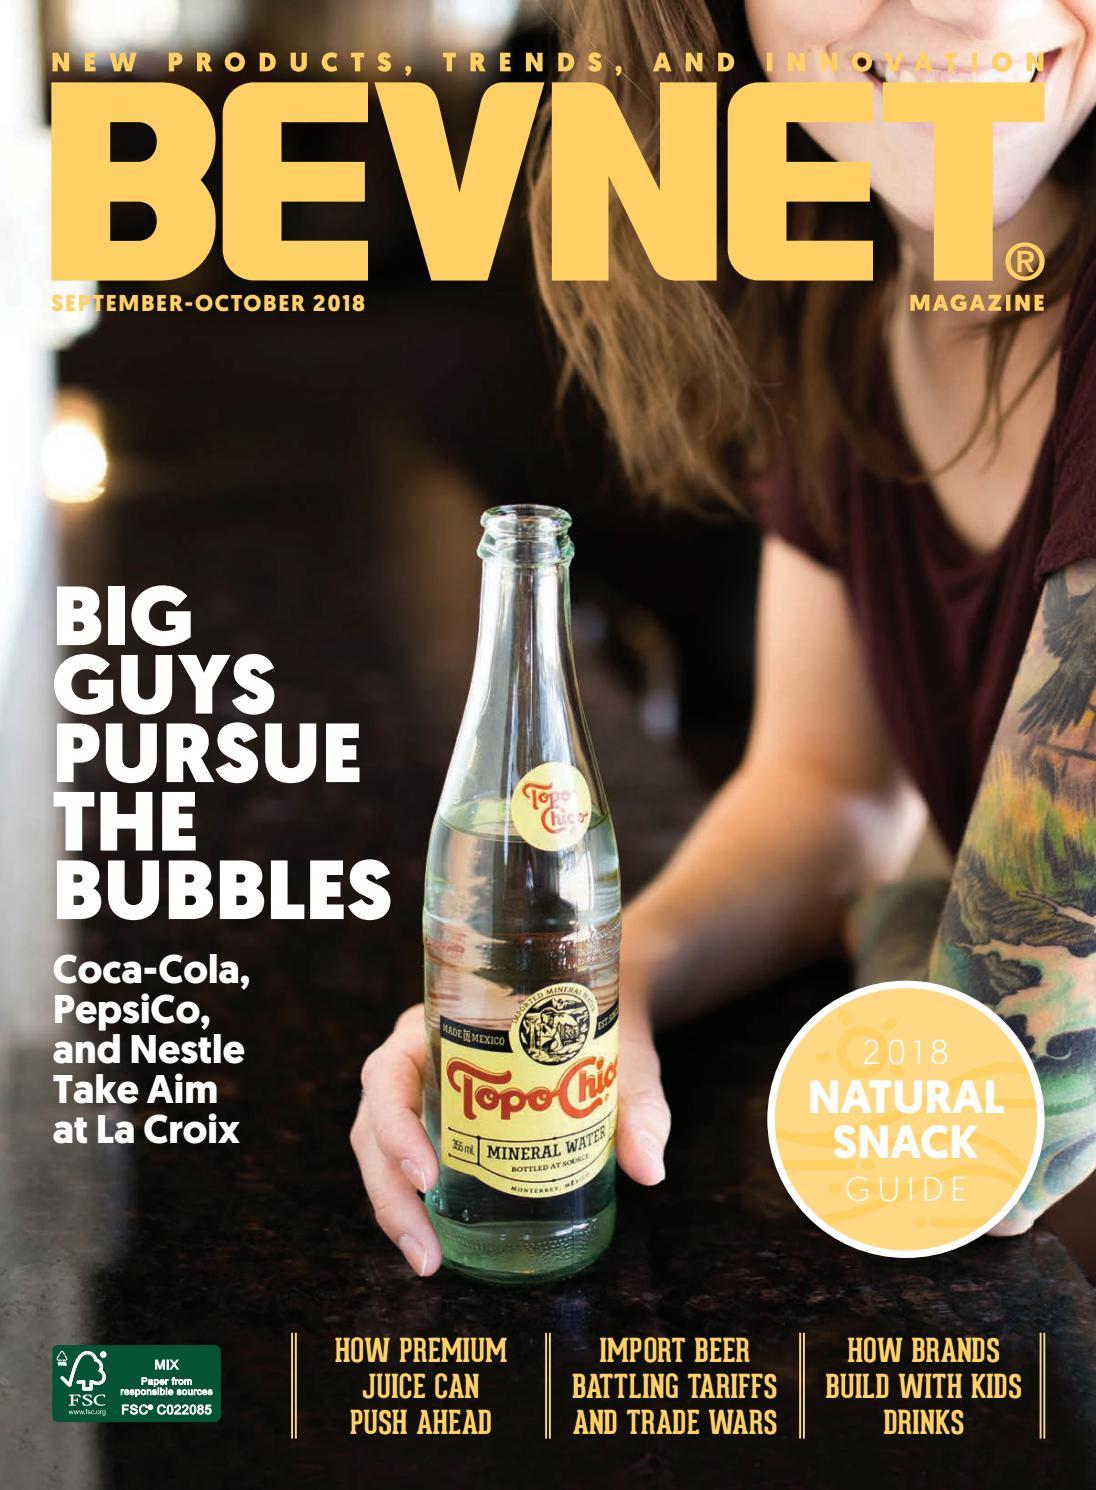 Bevnet Magazine September October 2018 By Bevnetcom Issuu Milo Cube 100 Pcs Free Bubble Wrapp